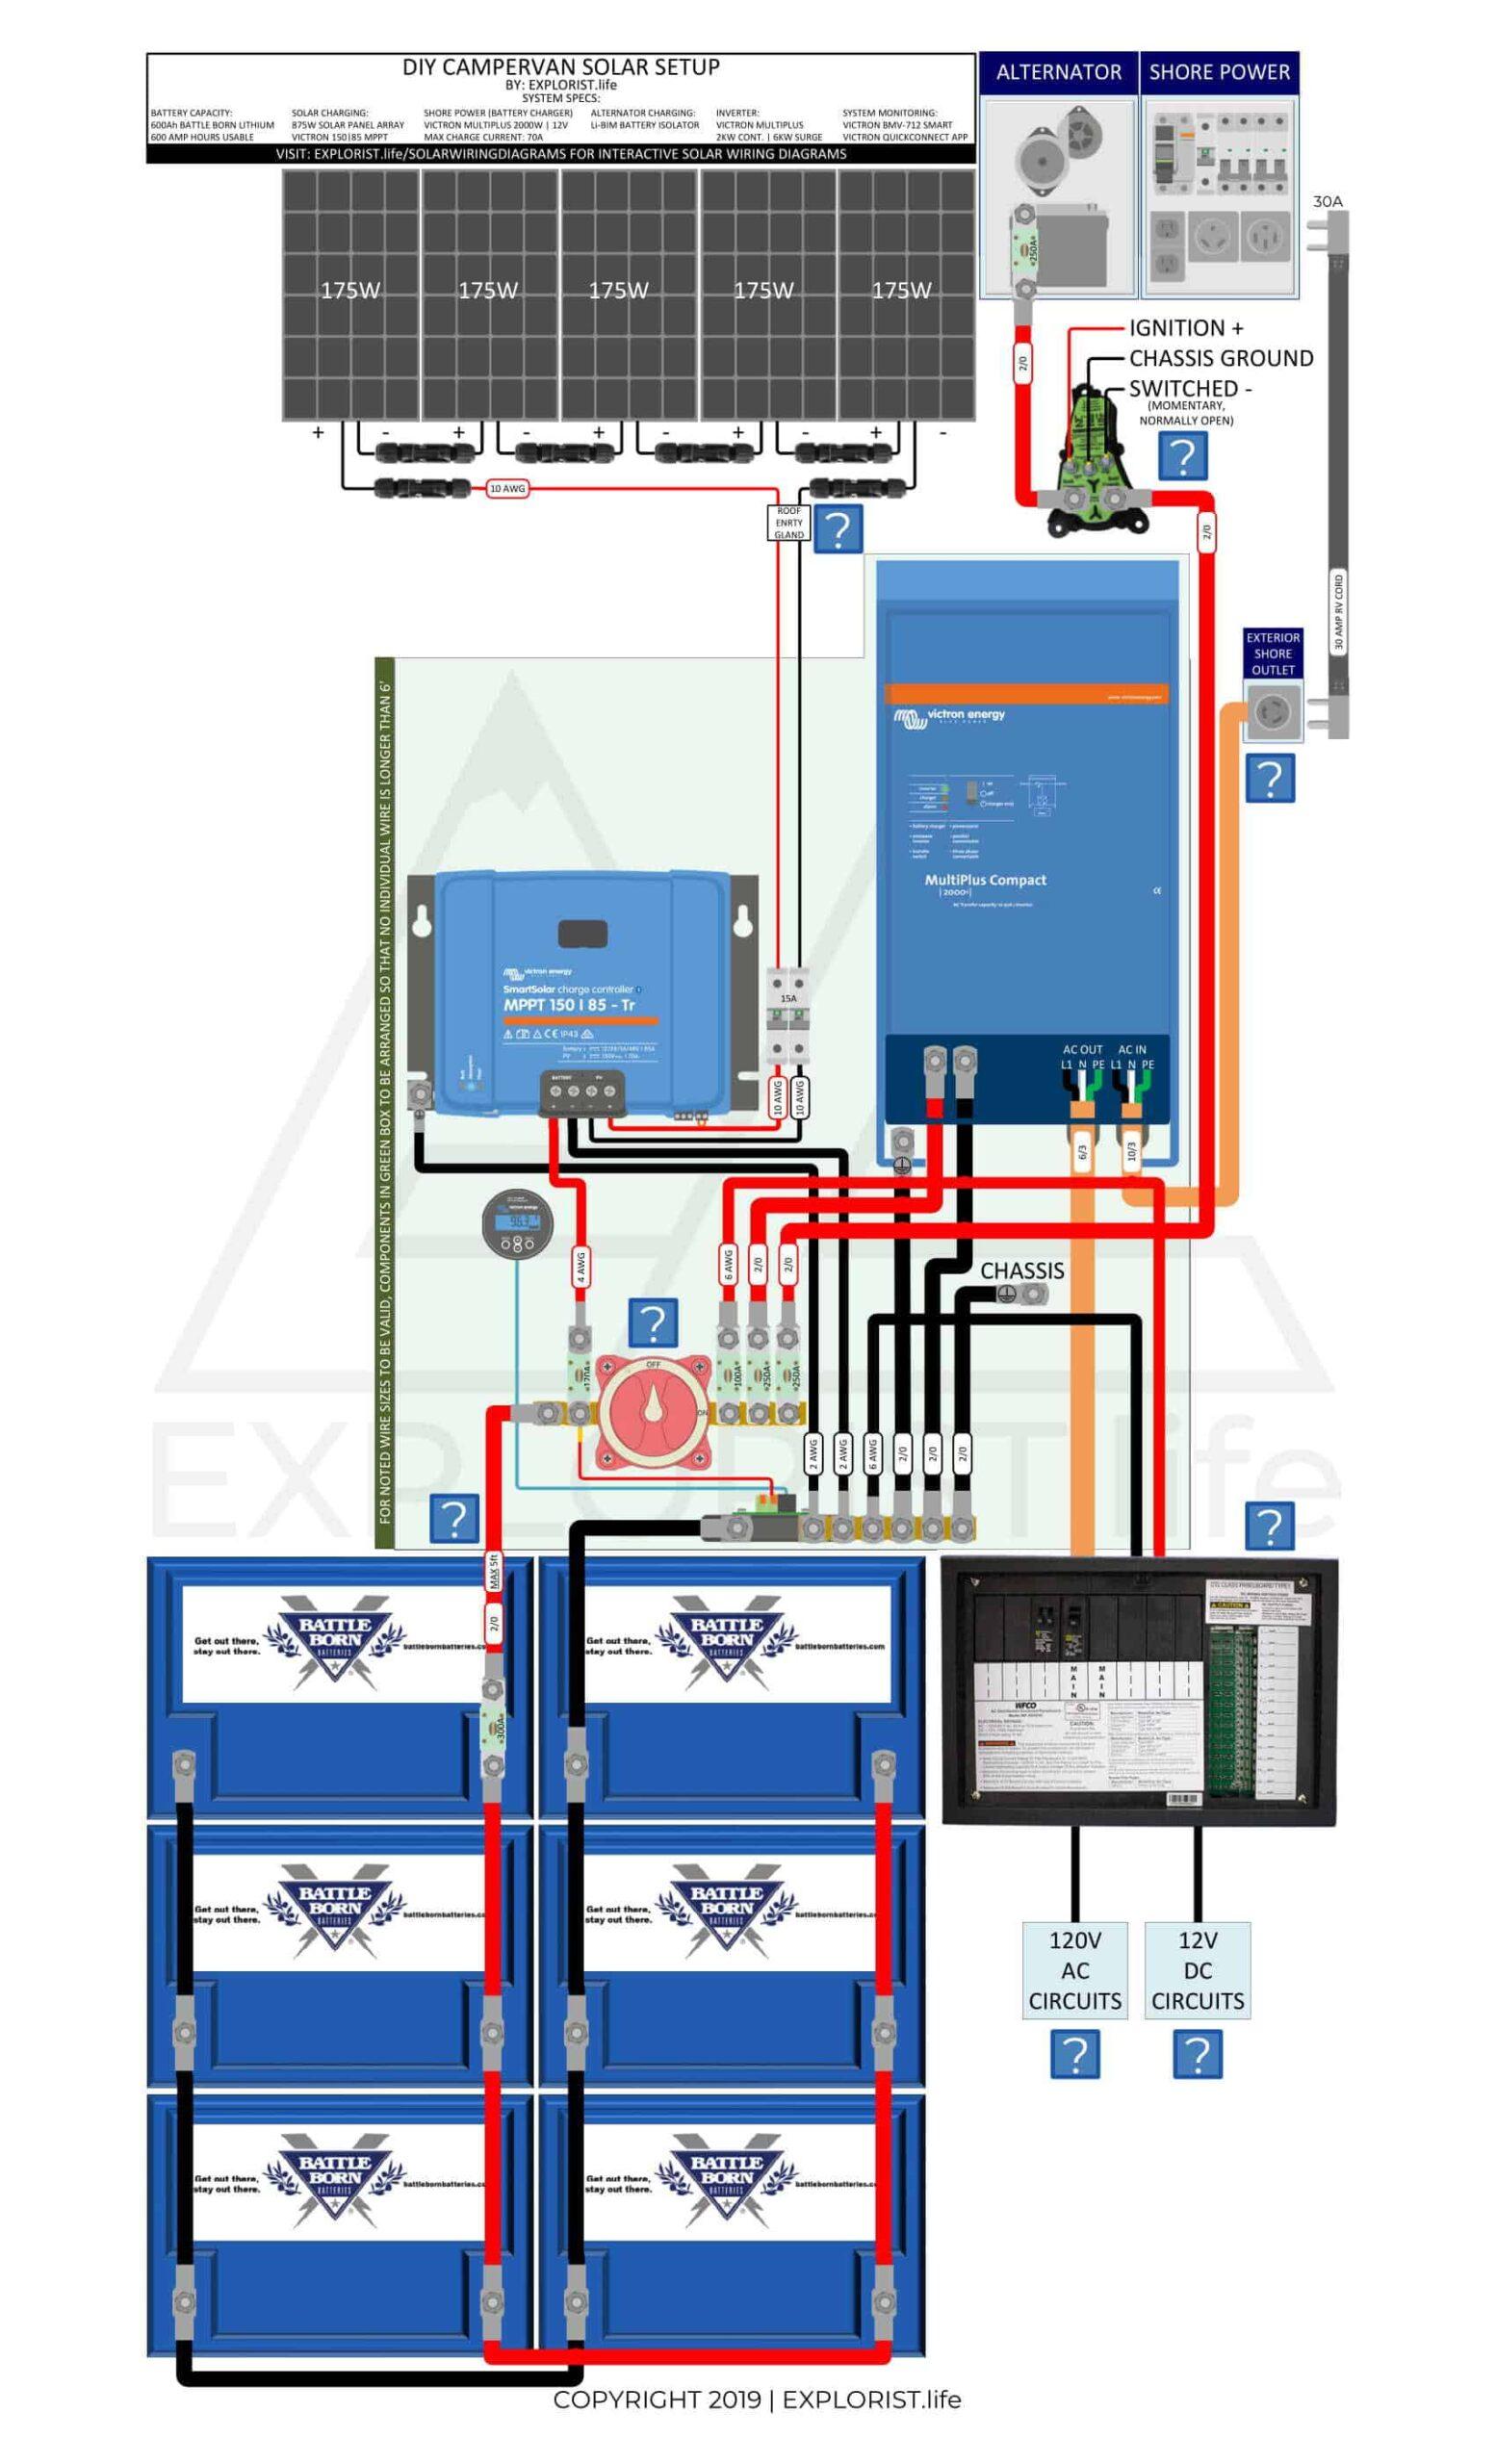 600Ah Lithium Battery Bank – 5x175W Solar – 2kW Inverter/Charger – Li-BIM Alternator Charging